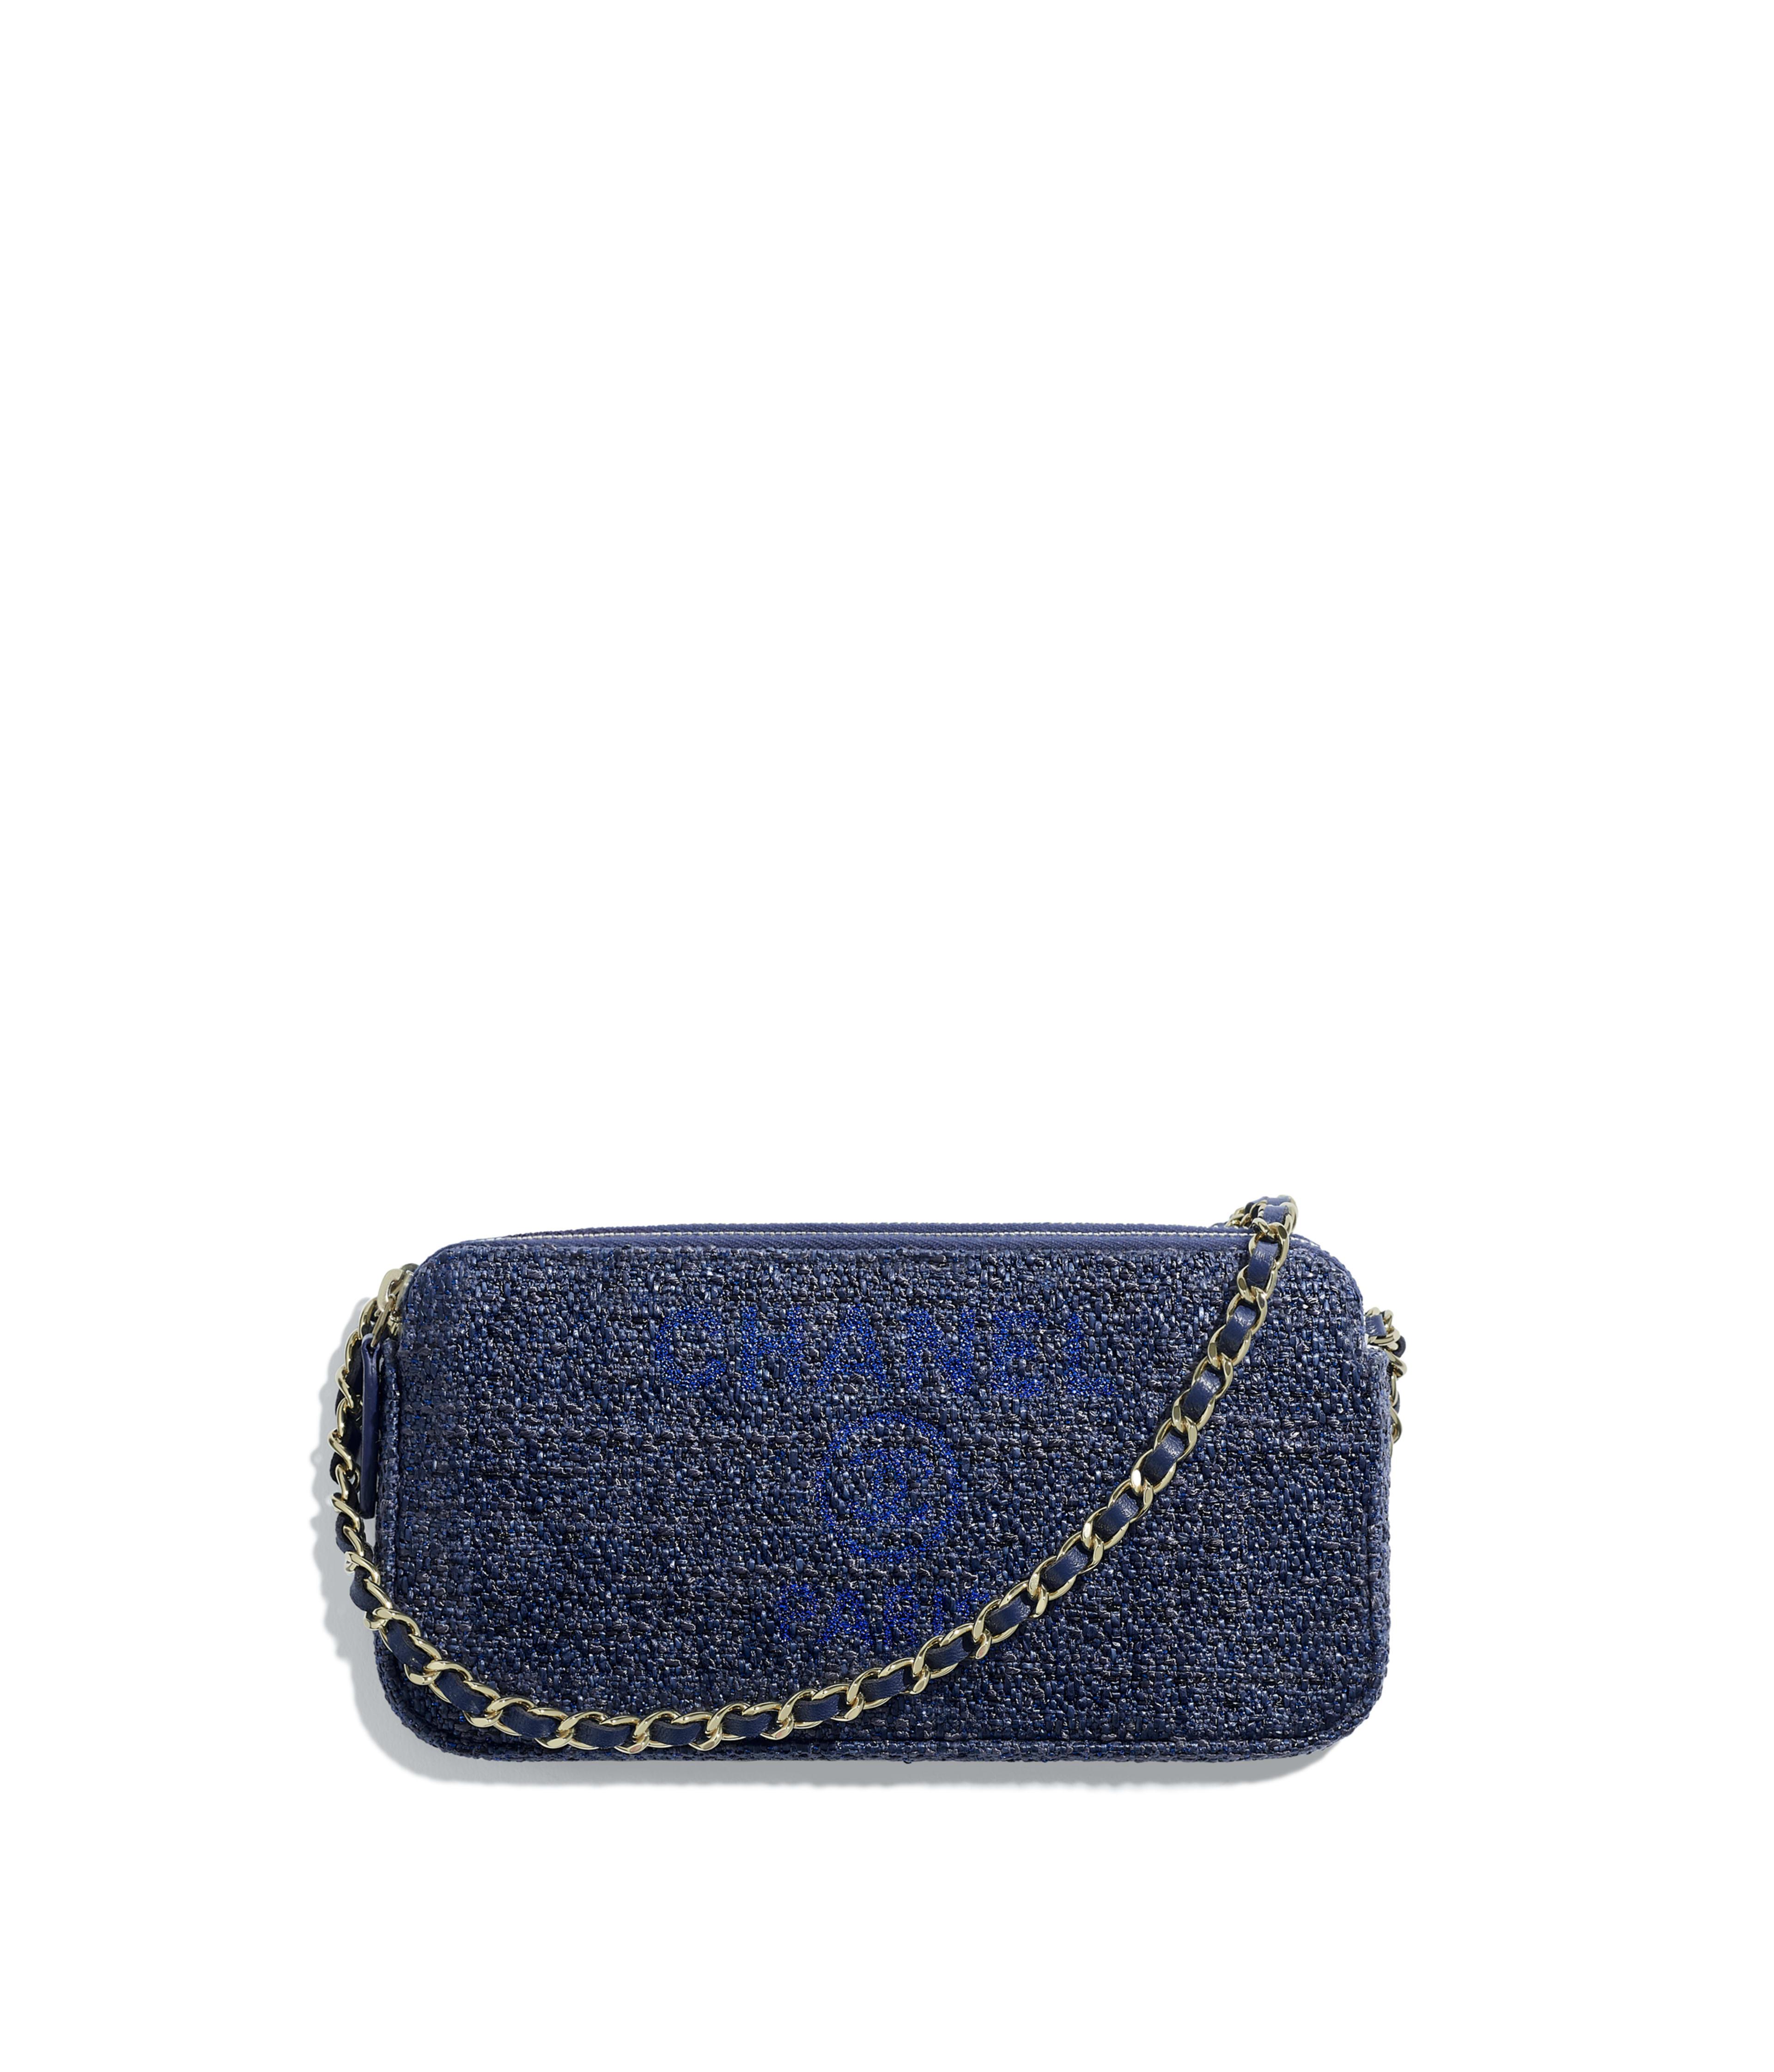 Clutch With Chain Canvas Gold Tone Metal Blue Ref A81978y334375b746